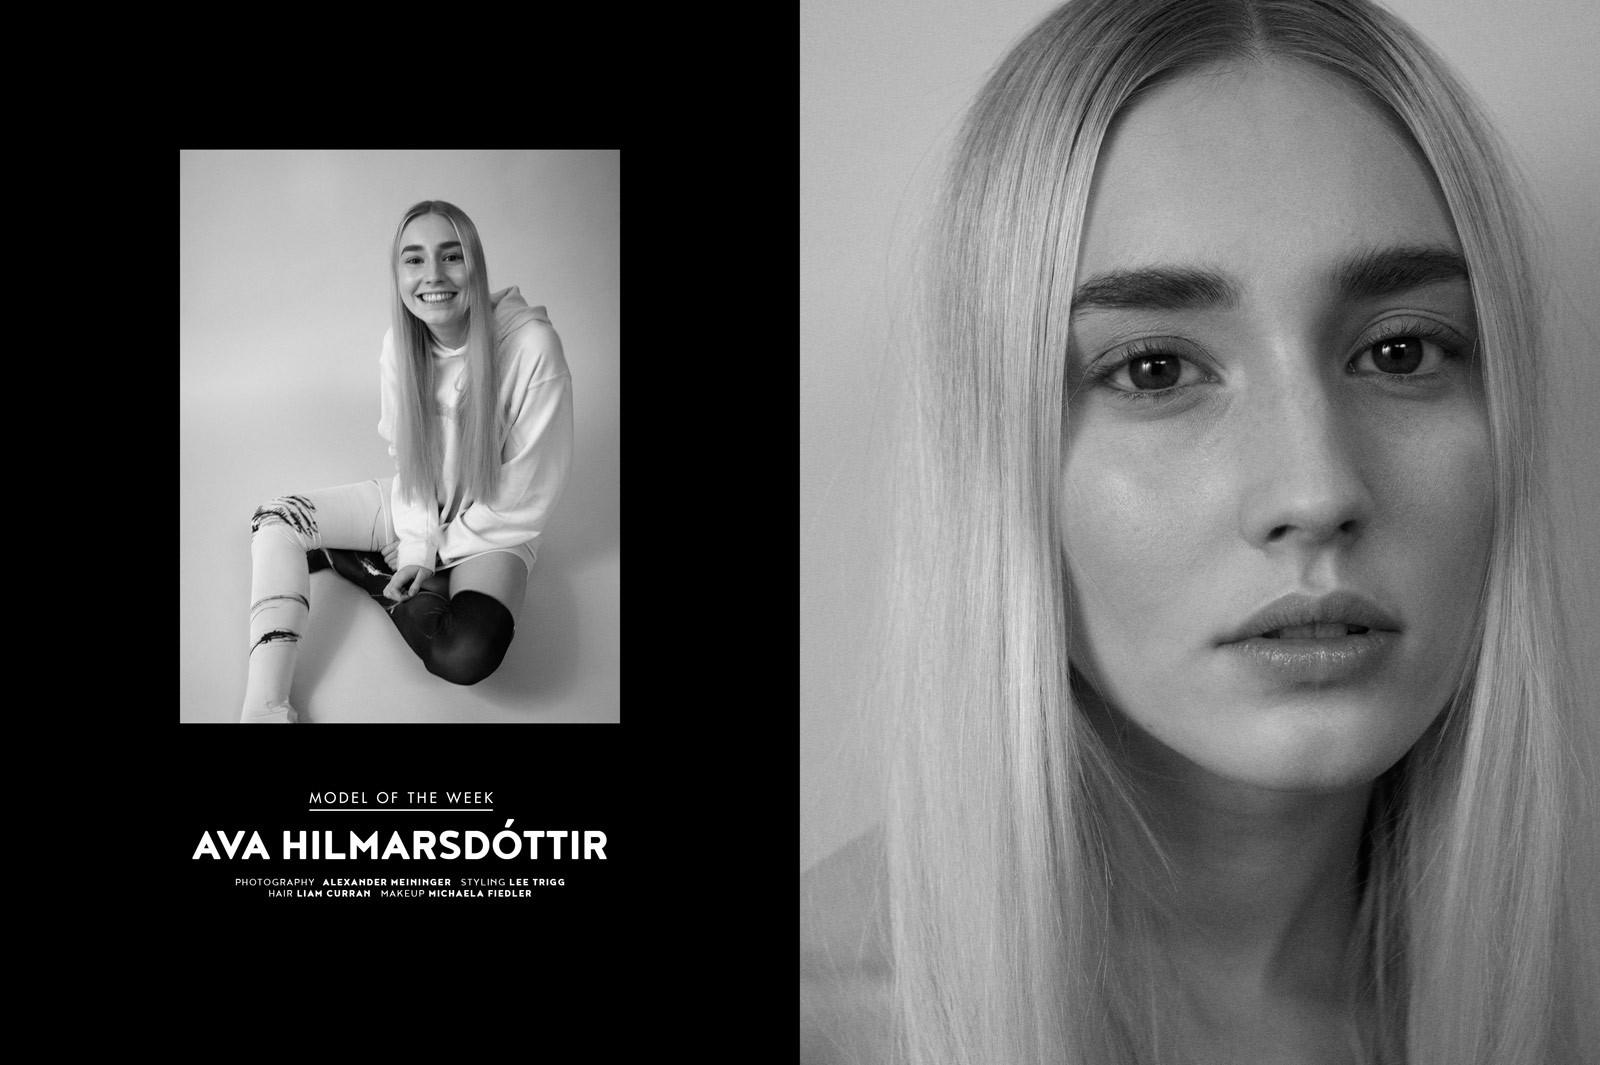 MOTW_AvaHilmarsdottir_Premier_web-1600_01